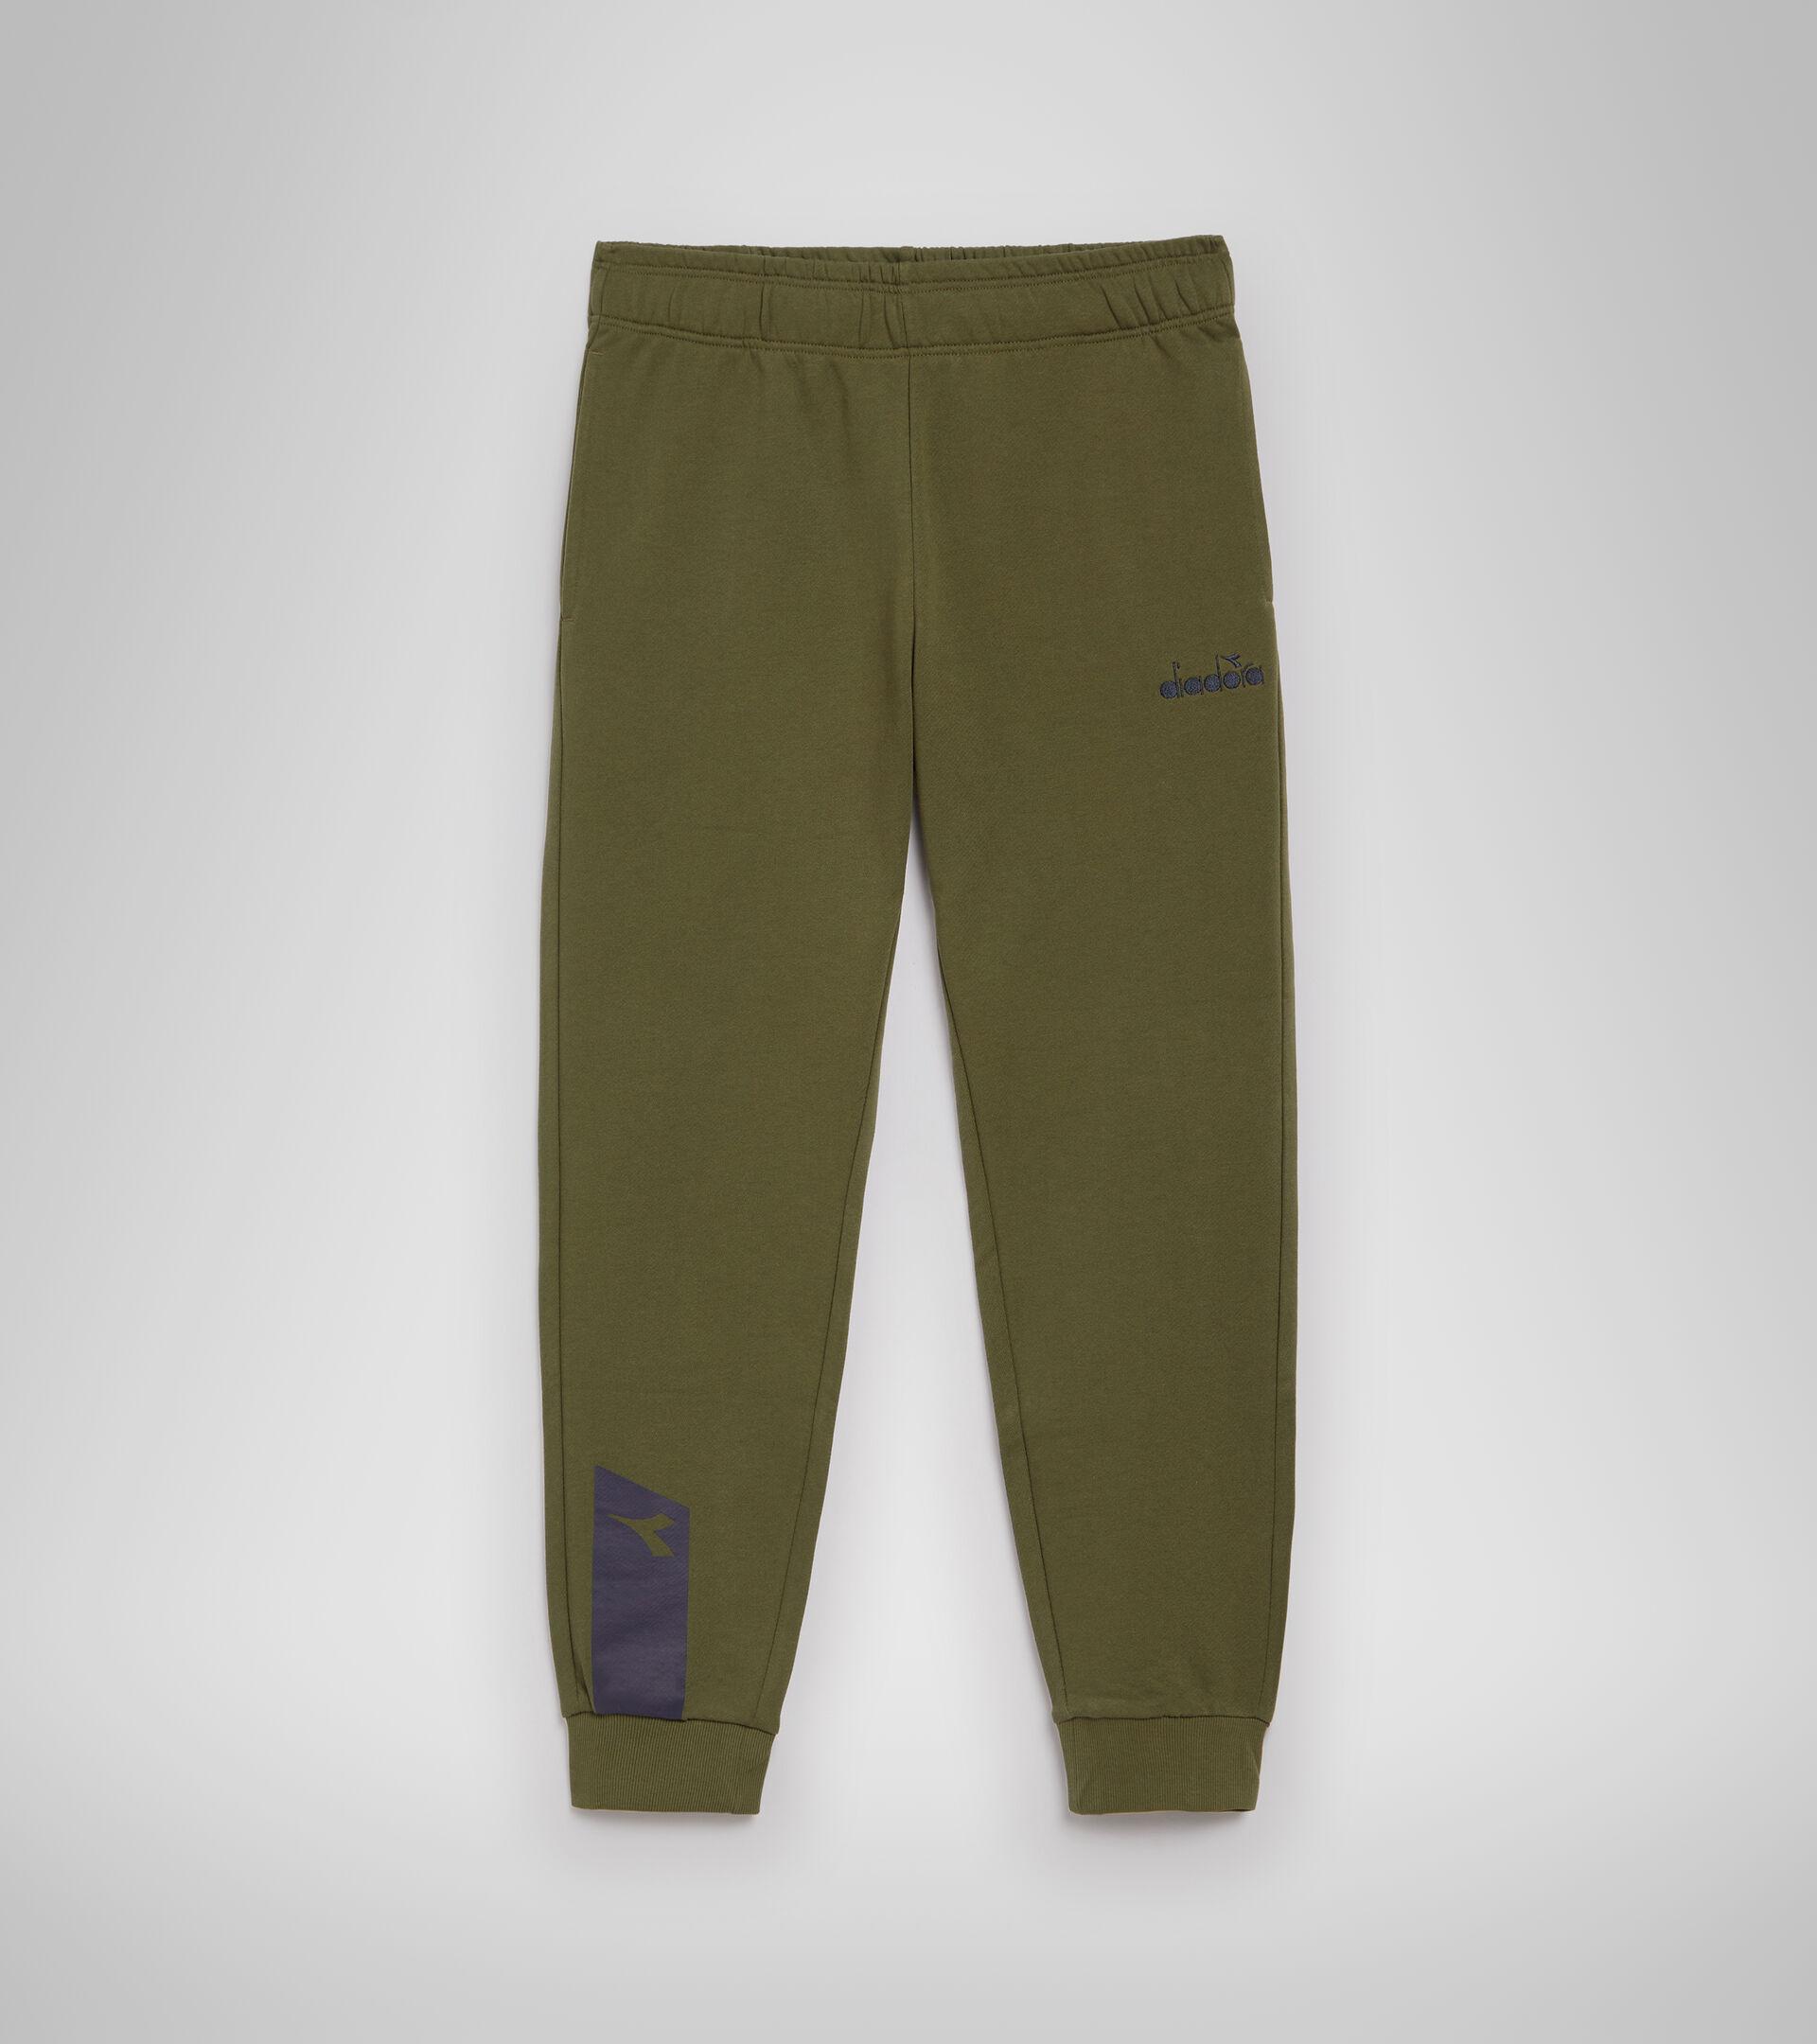 Apparel Sportswear UOMO PANT ICON VERDE CIPRESSO Diadora